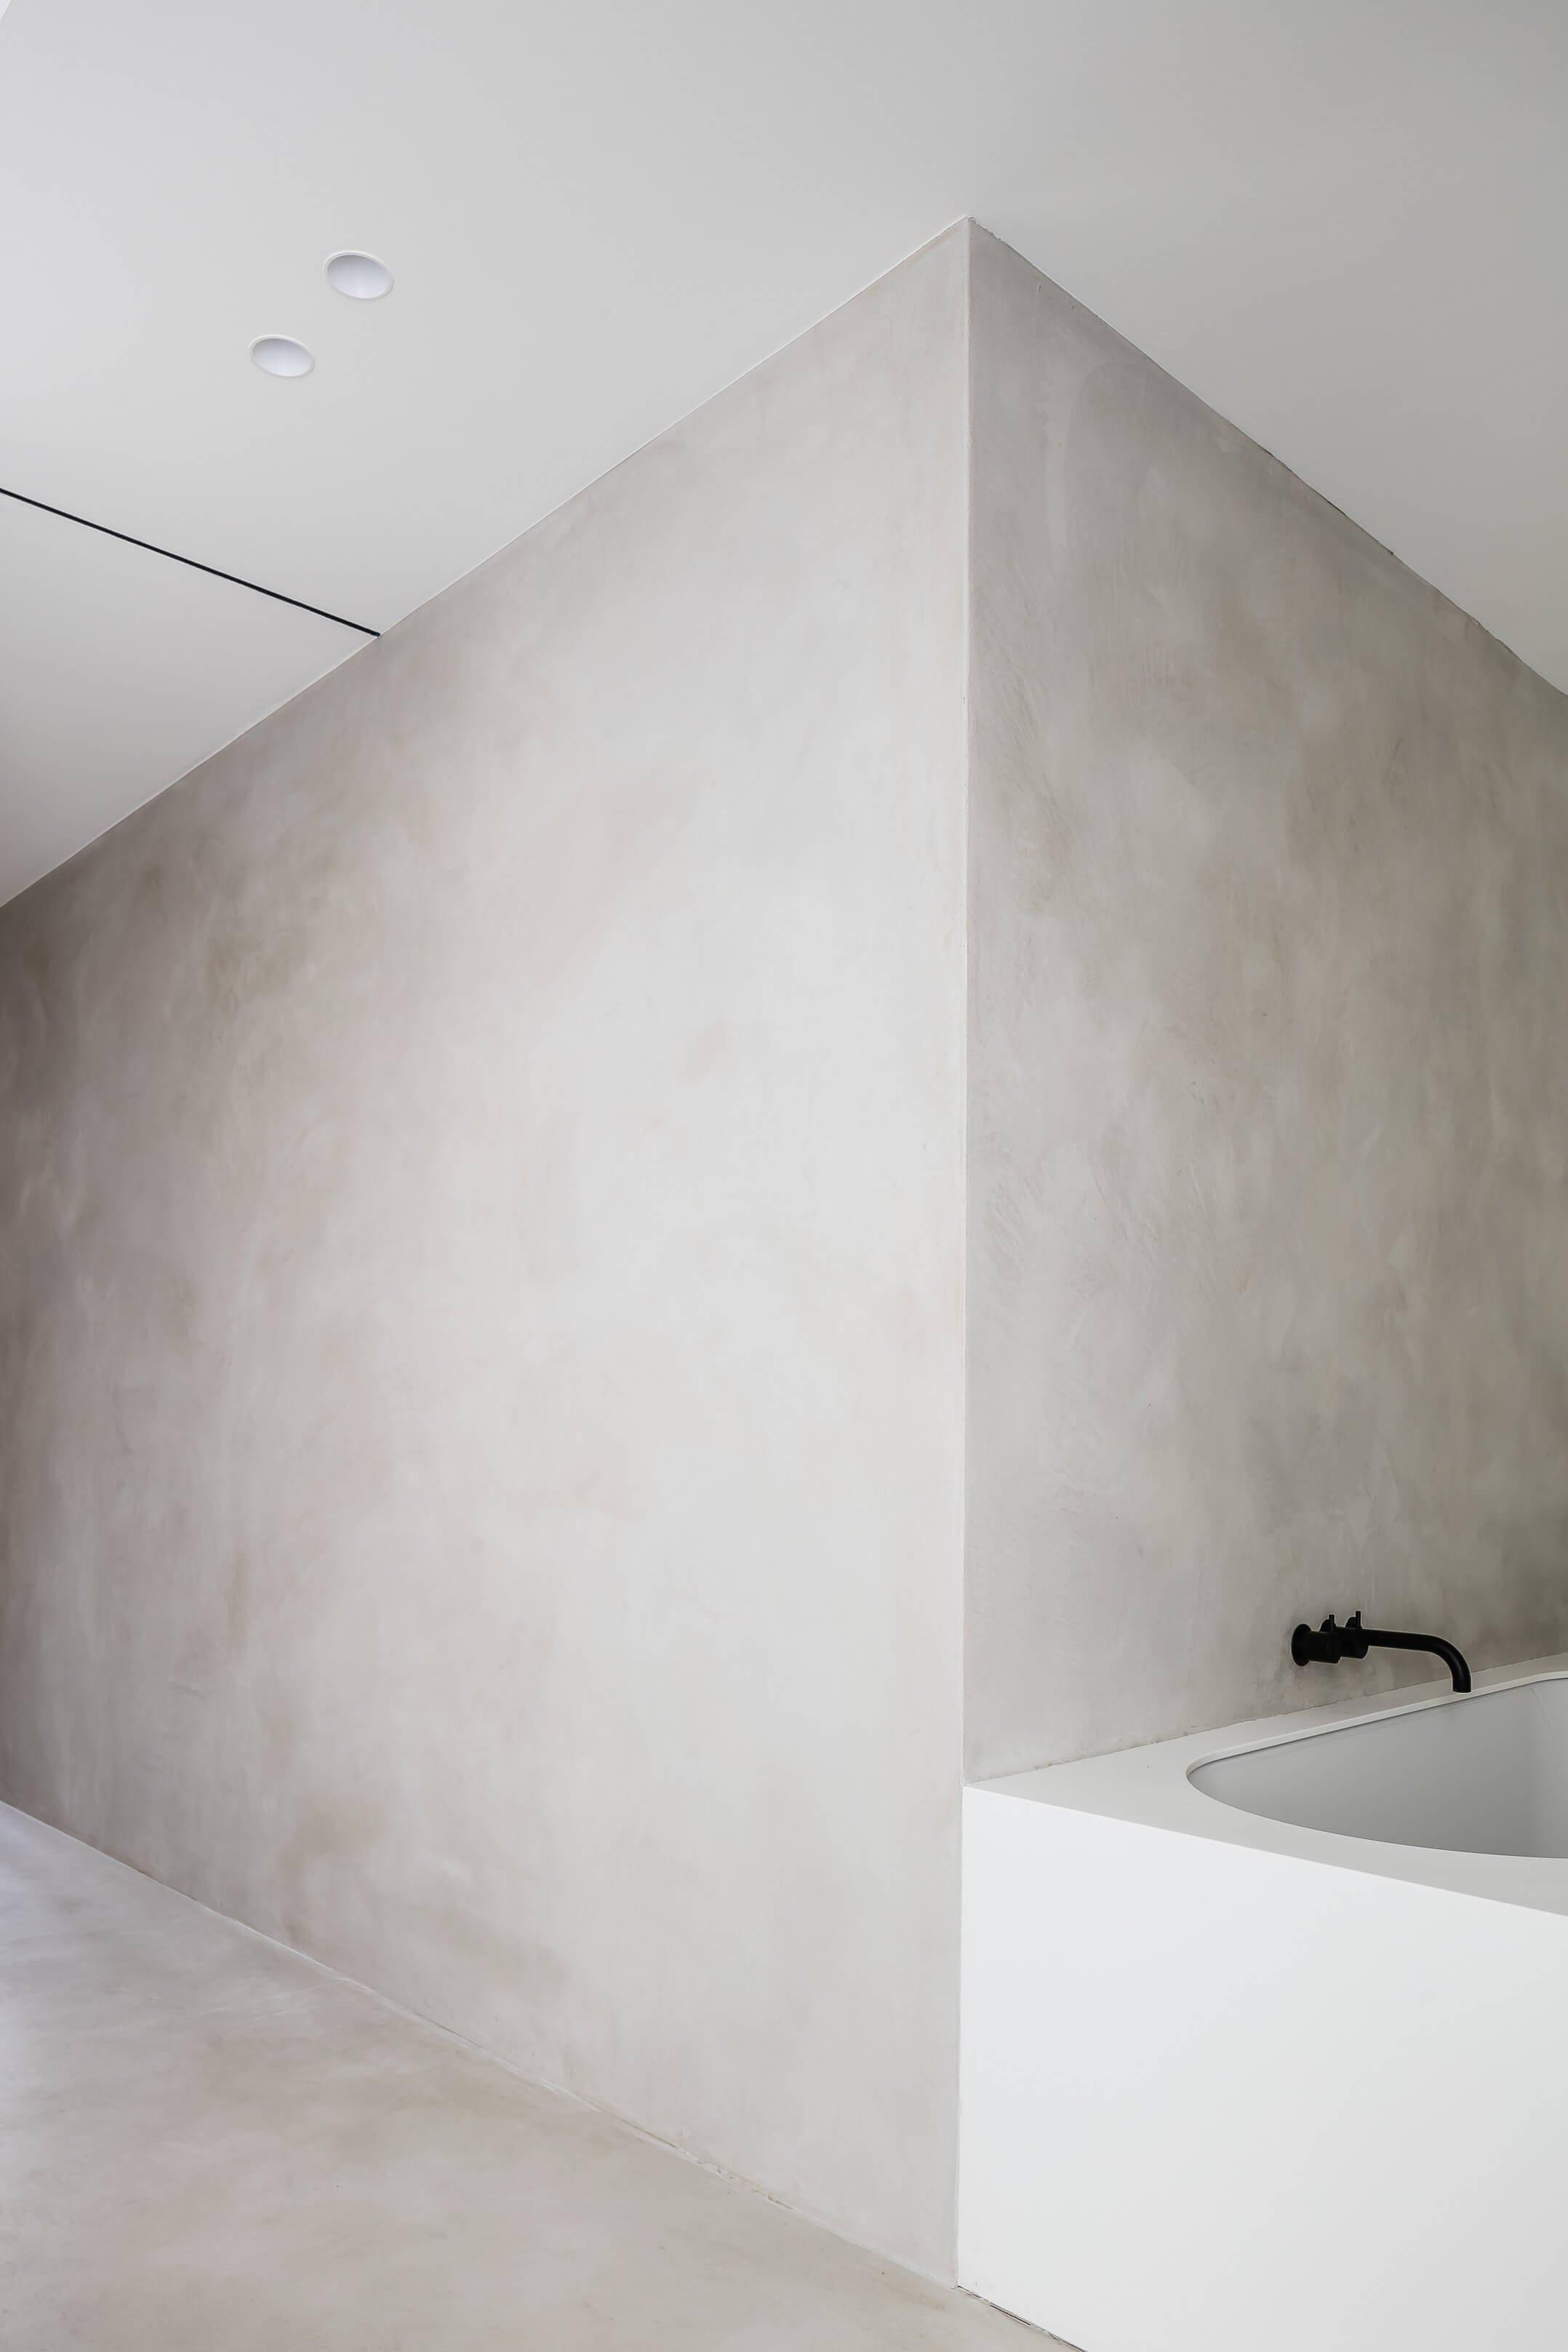 Rietveldprojects.be-five-am-rrr-odilon-creations-photobycafeine26.jpg